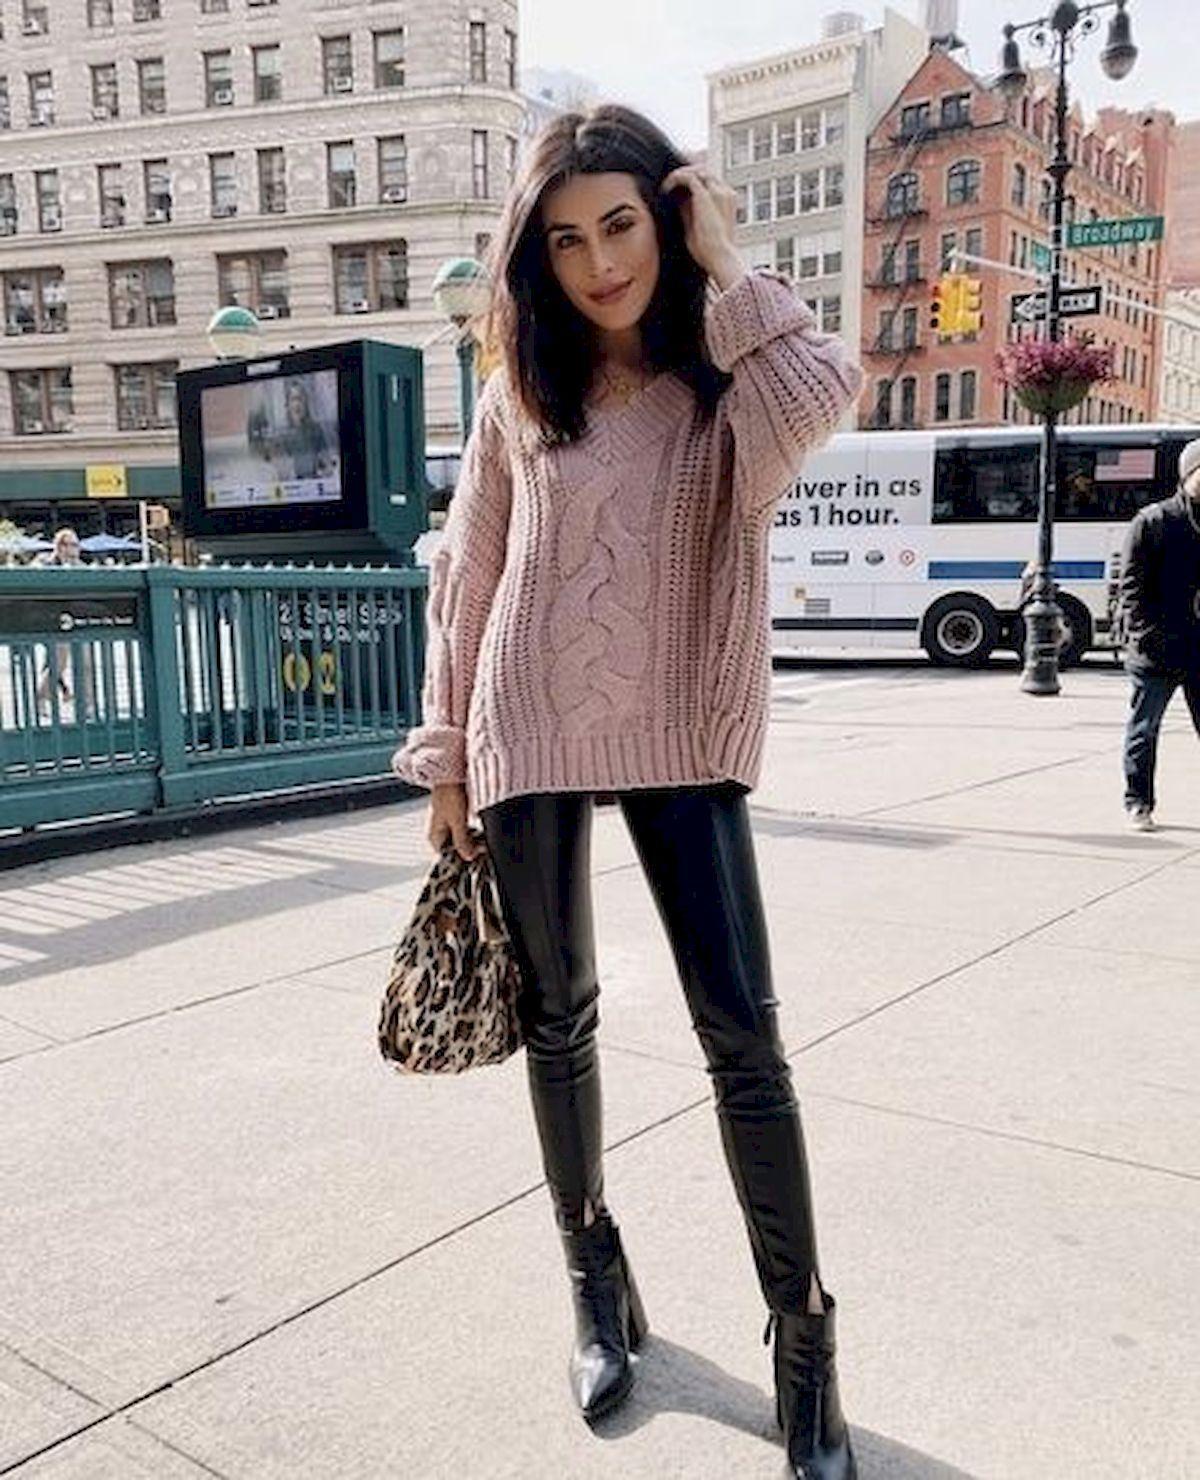 ab74c819745 Cool 55 Best Ideas Outfits for Short Women source    https   trendingofashion.